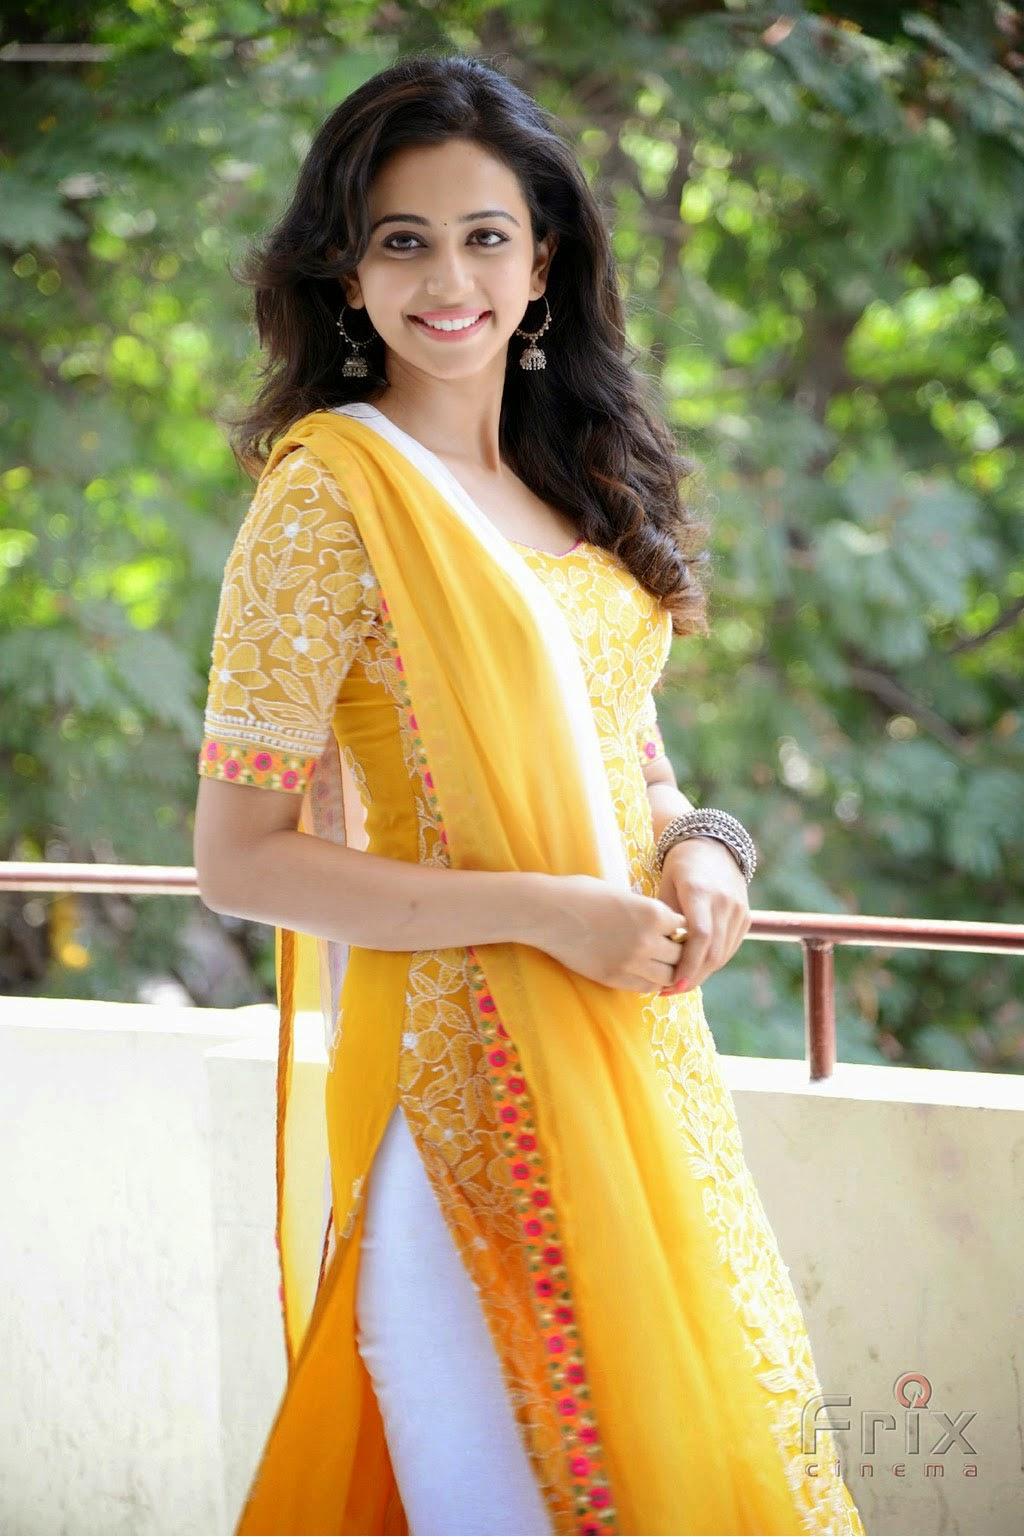 Actress Rahul preet singh in yellow dress pics